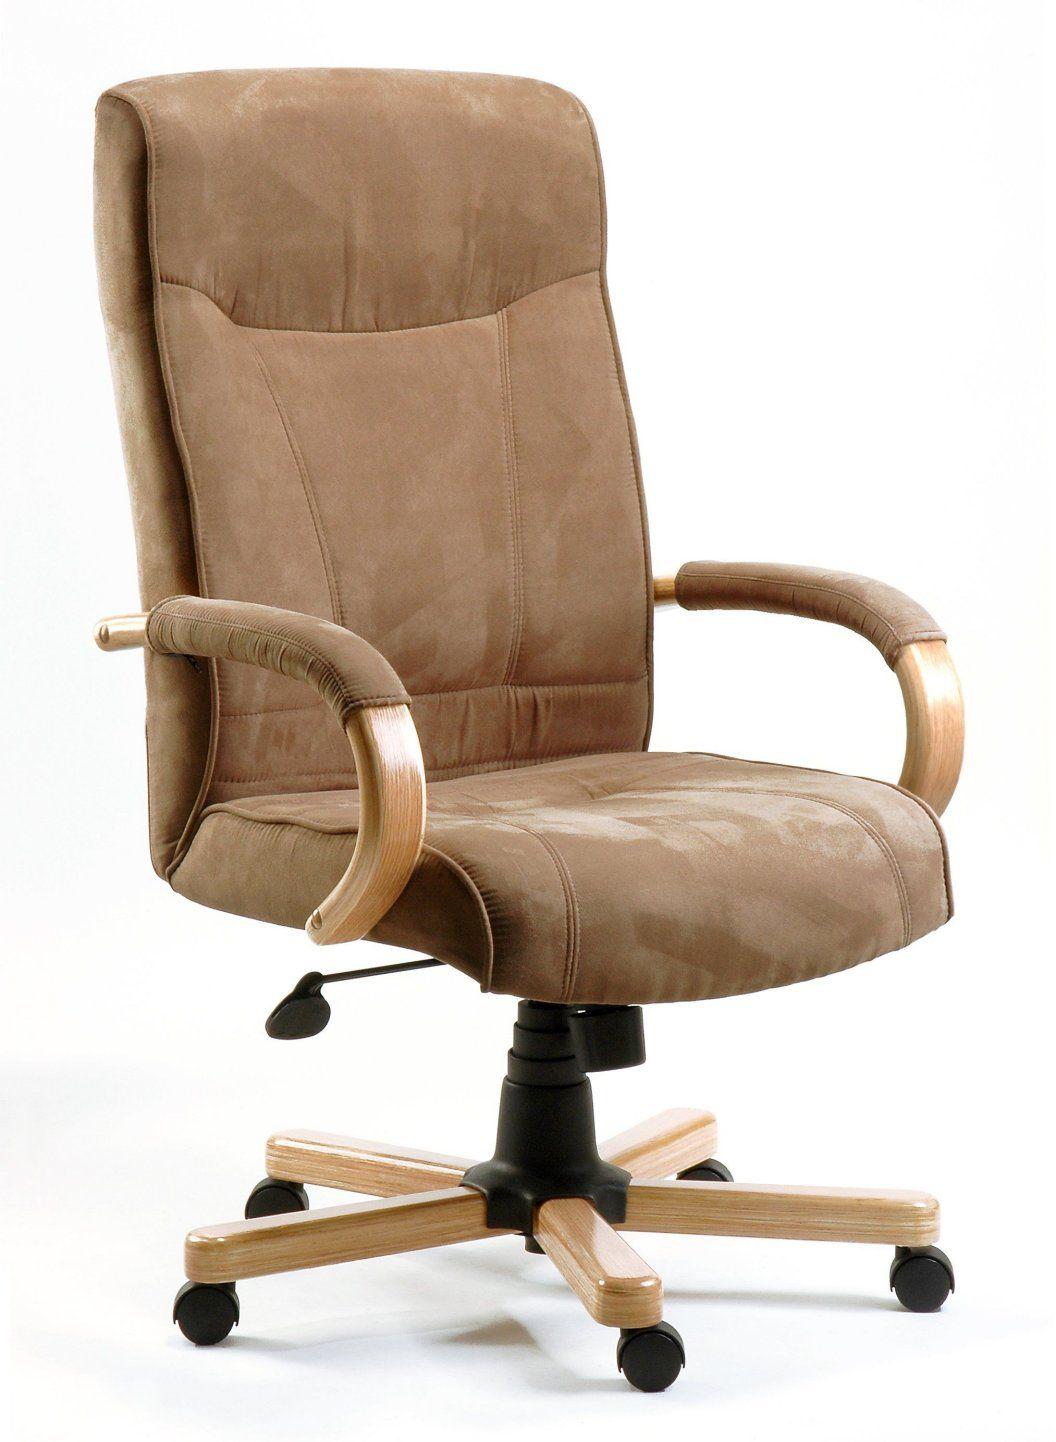 günstige Bürostühle online Bürostuhl, Stühle mit hoher